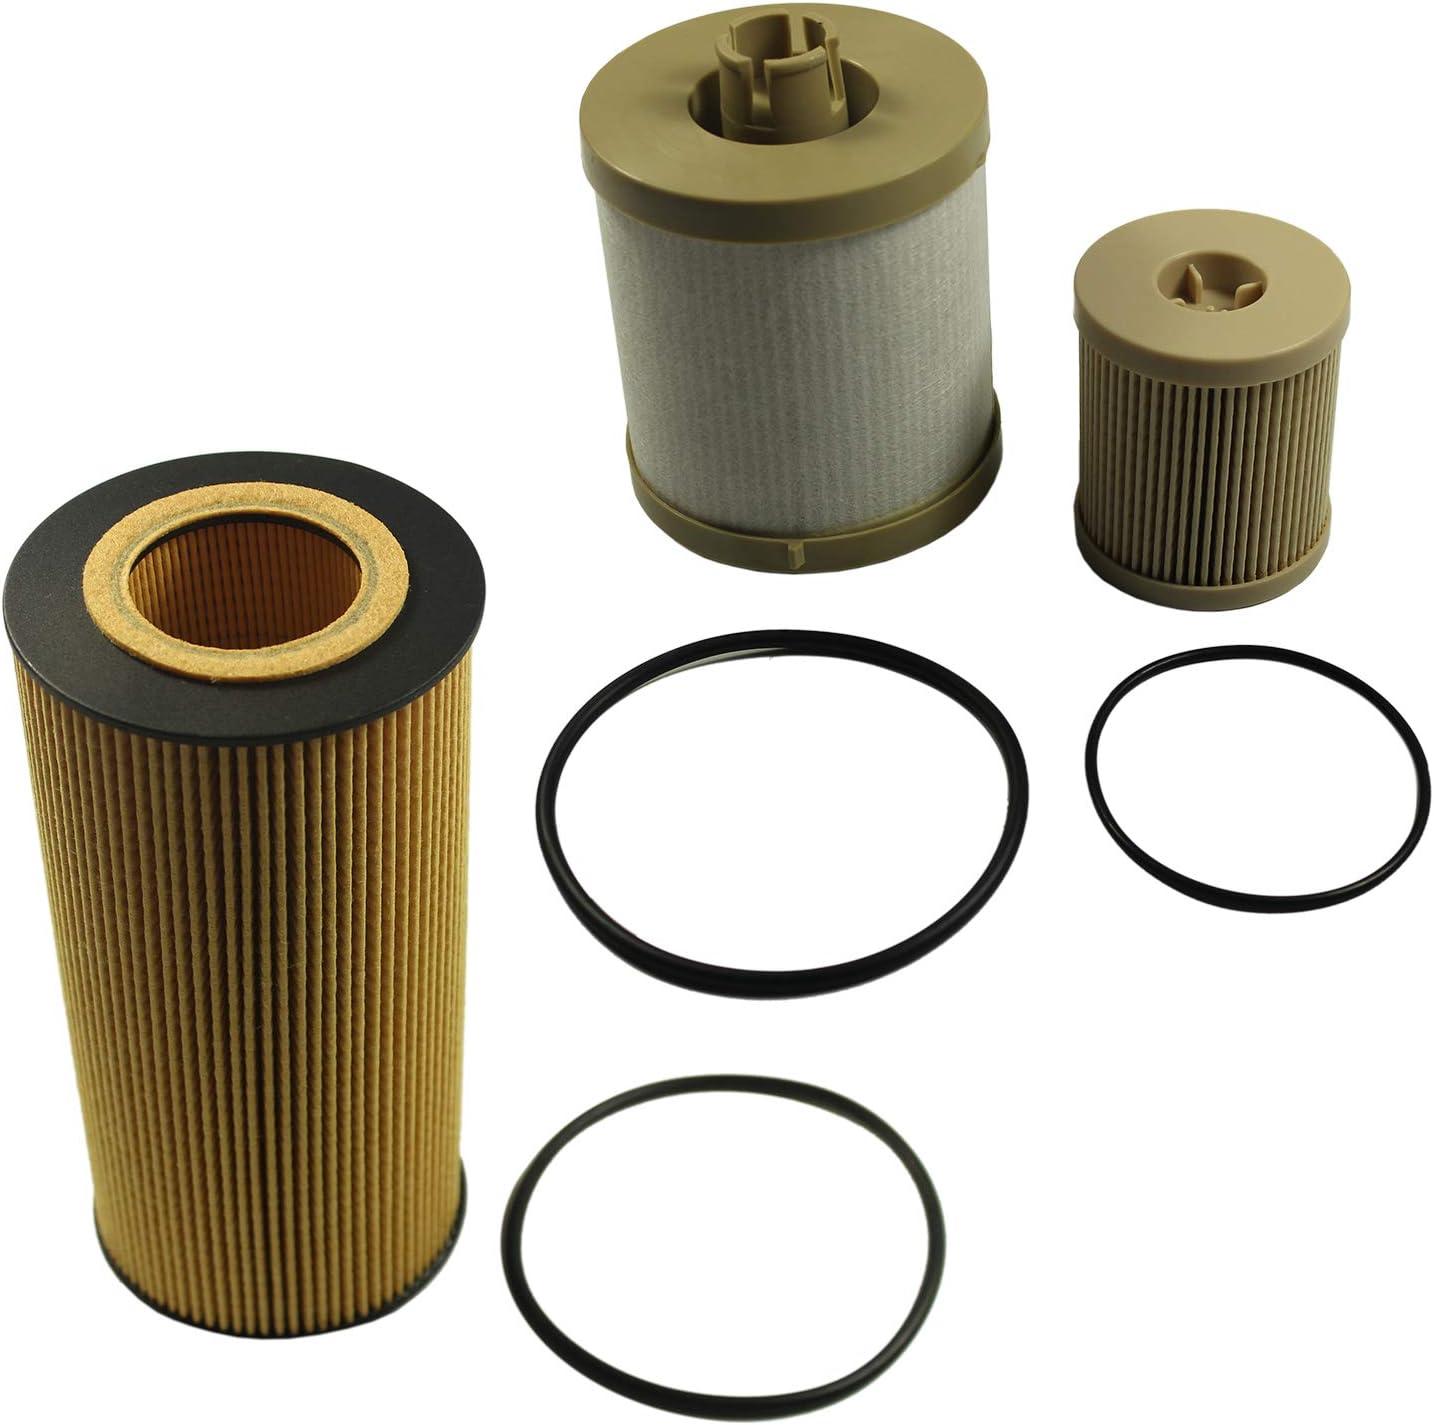 03-07 for Ford F250 F350 F450 Super Duty Powerstroke Billet Oil Fuel Filter Cap